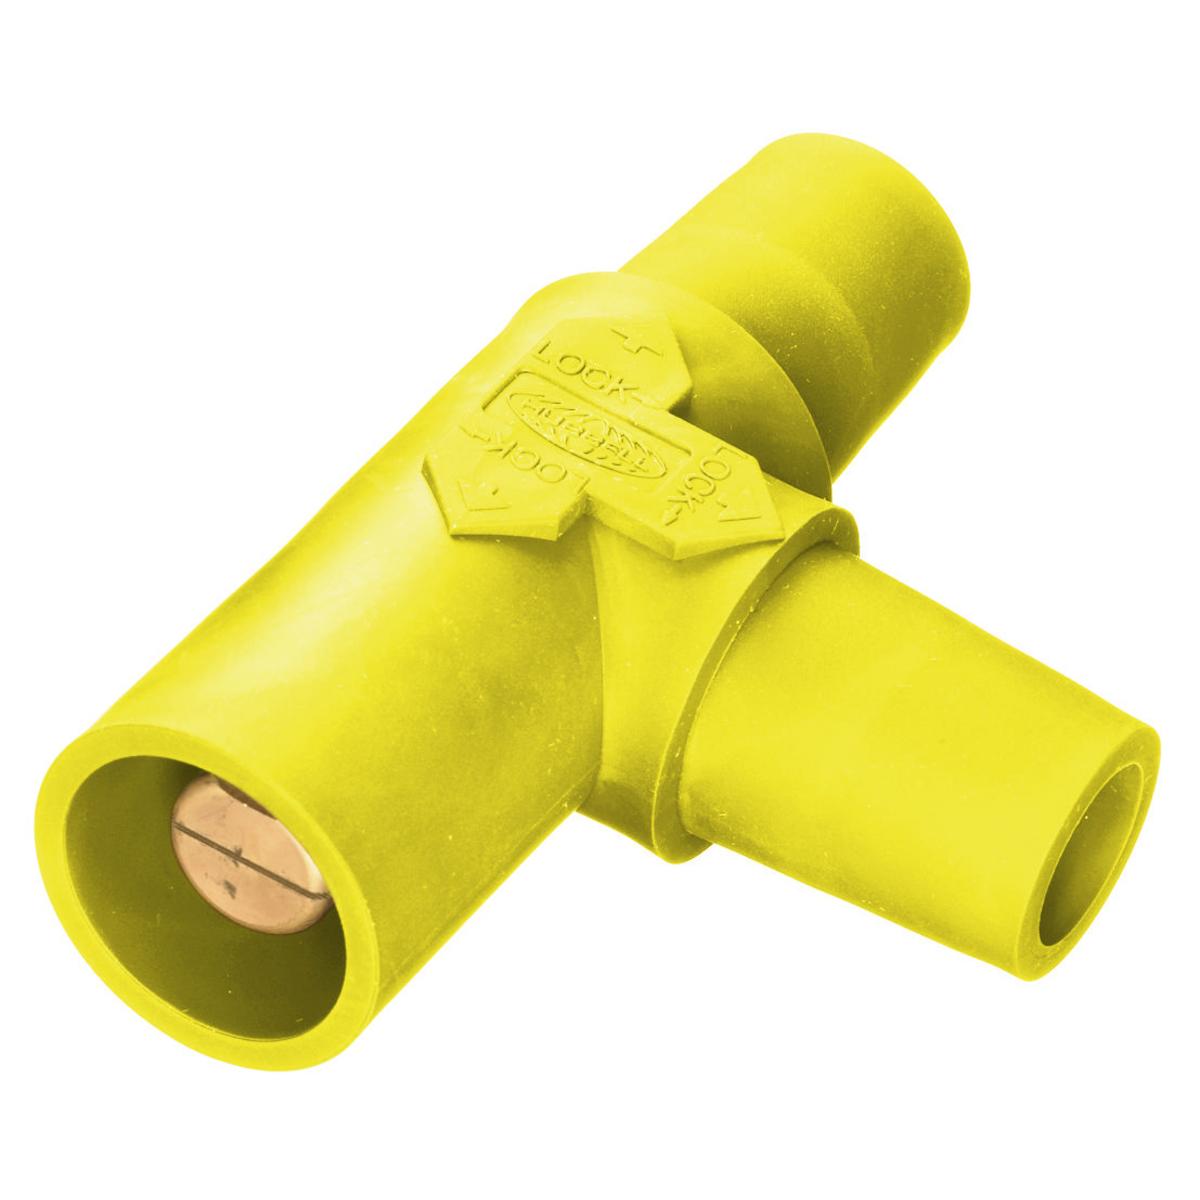 Hubbell HBLTY Single Pole, TAPPING T, FEM-FEM-MALE, YL